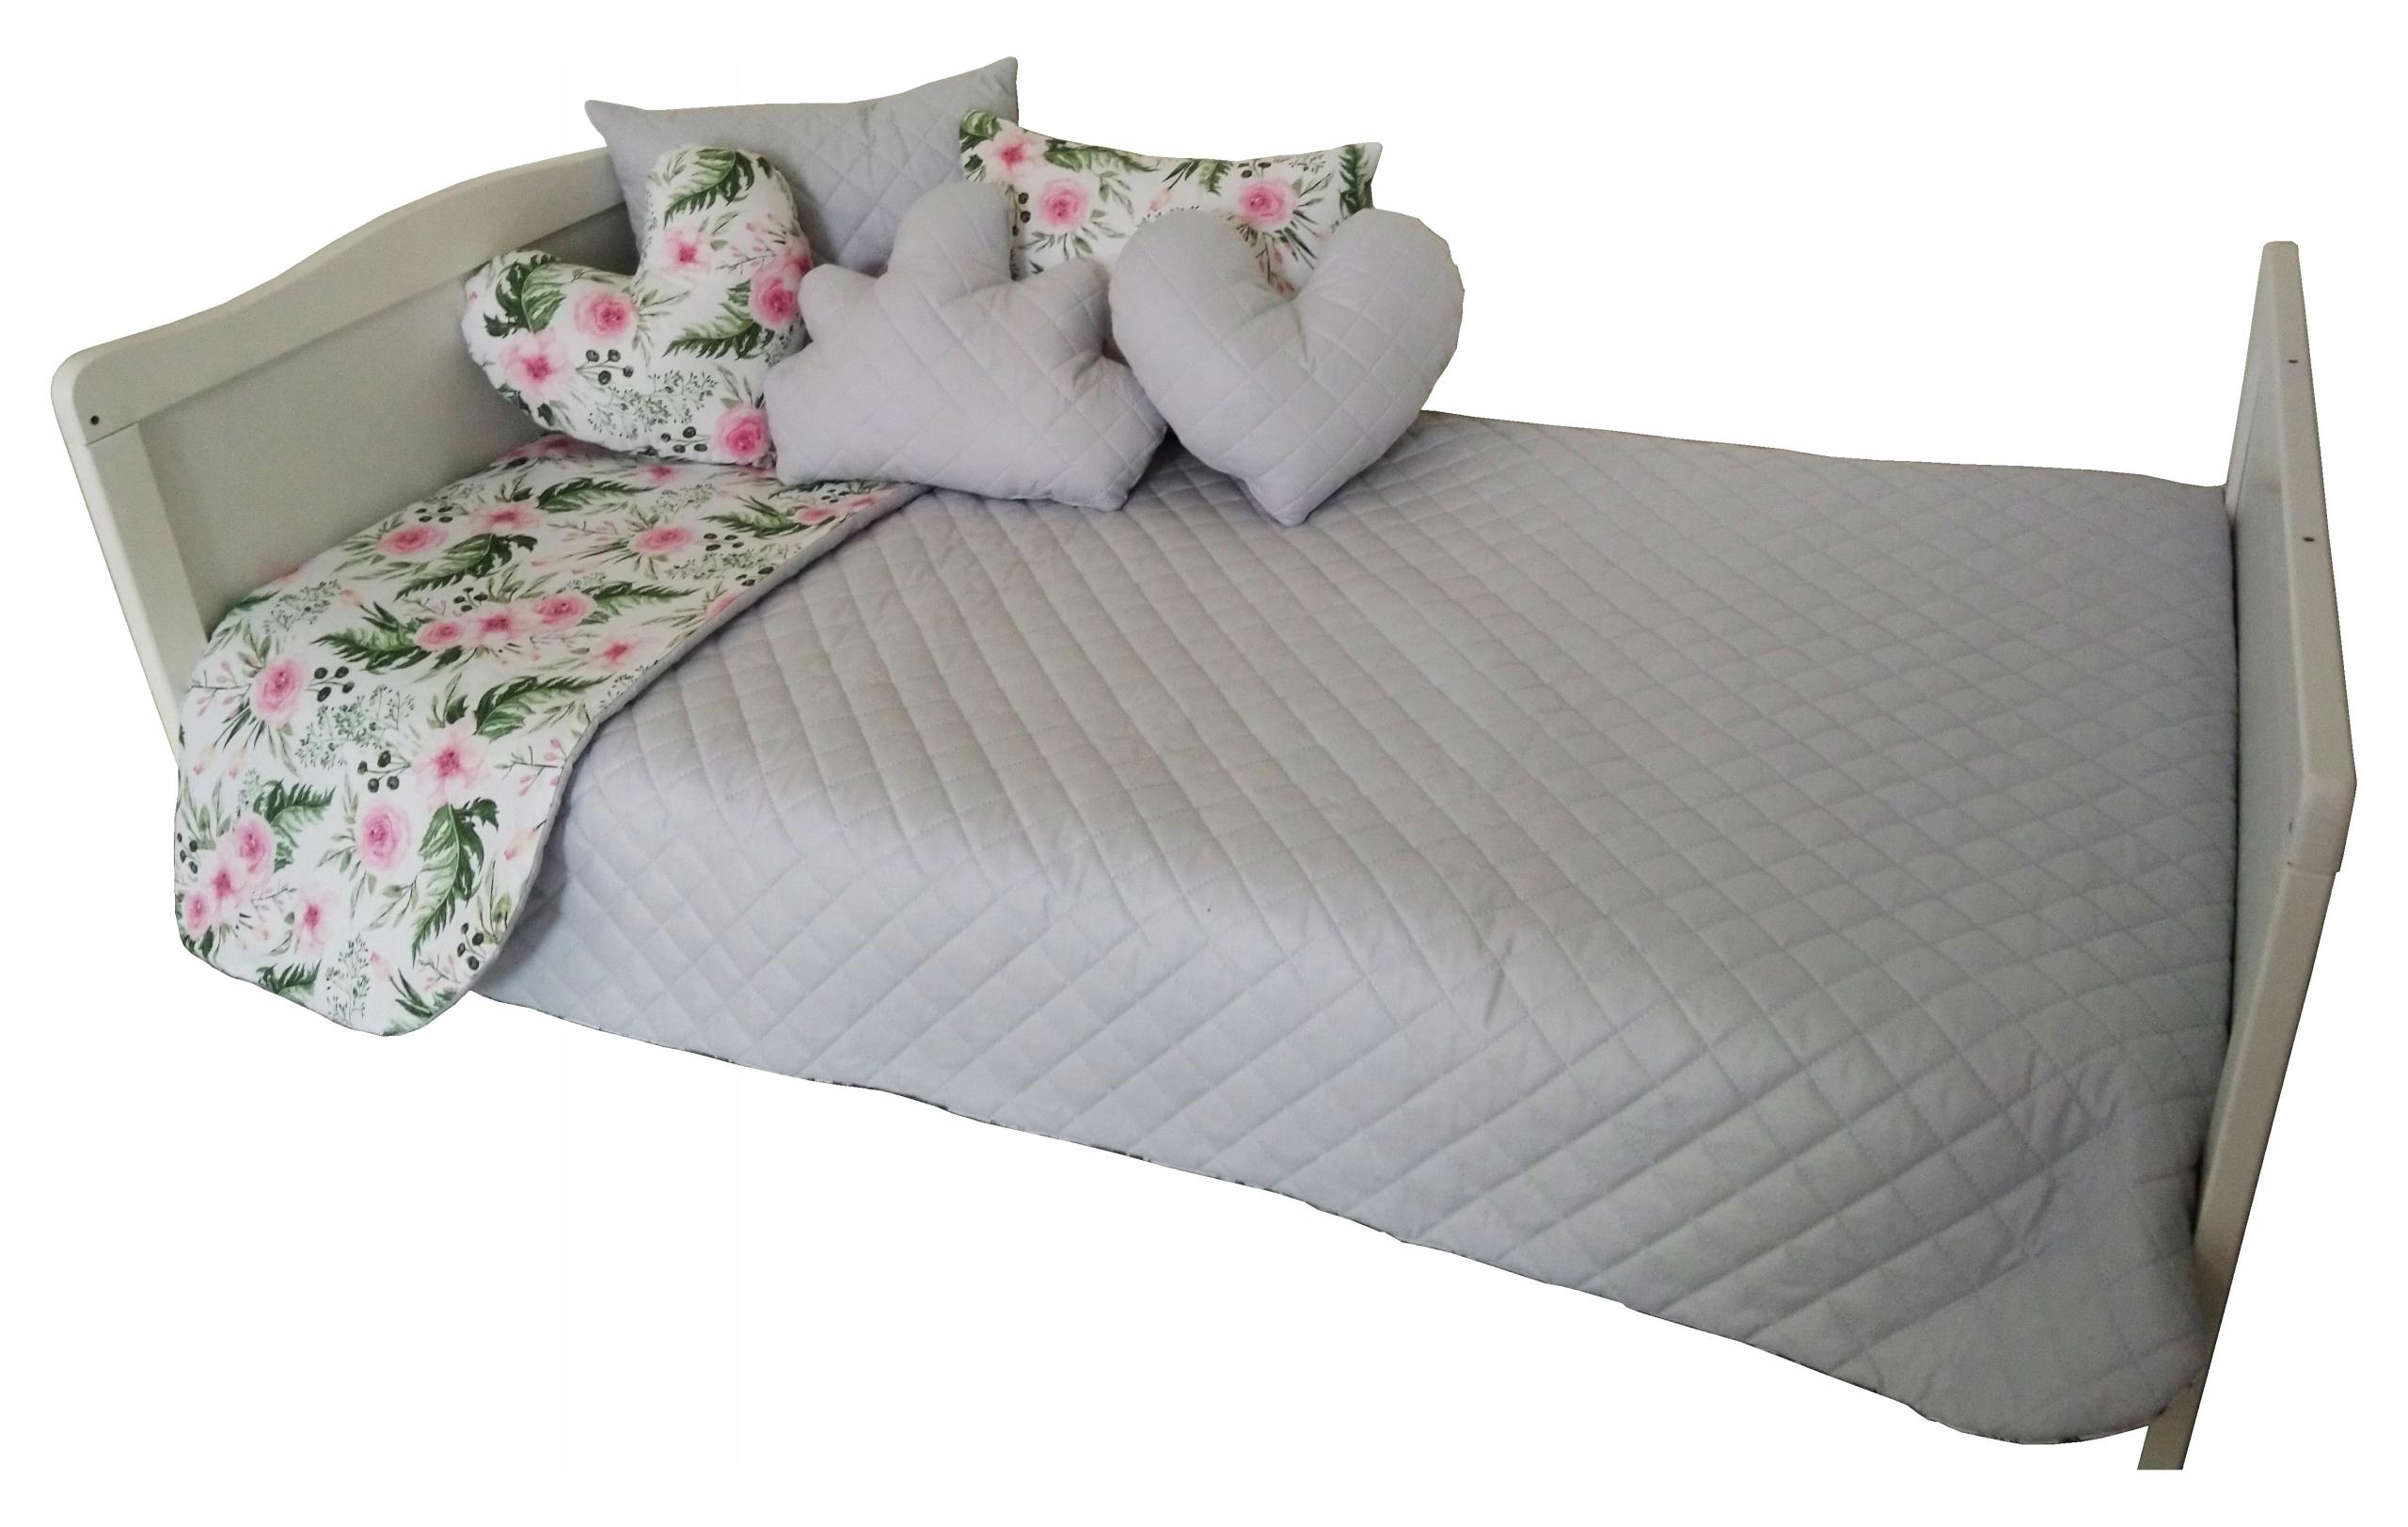 75a61a81f707a4 Narzuta na łóżko dziecięce pikowana 120x200 GRATIS 7908163868 - Allegro.pl